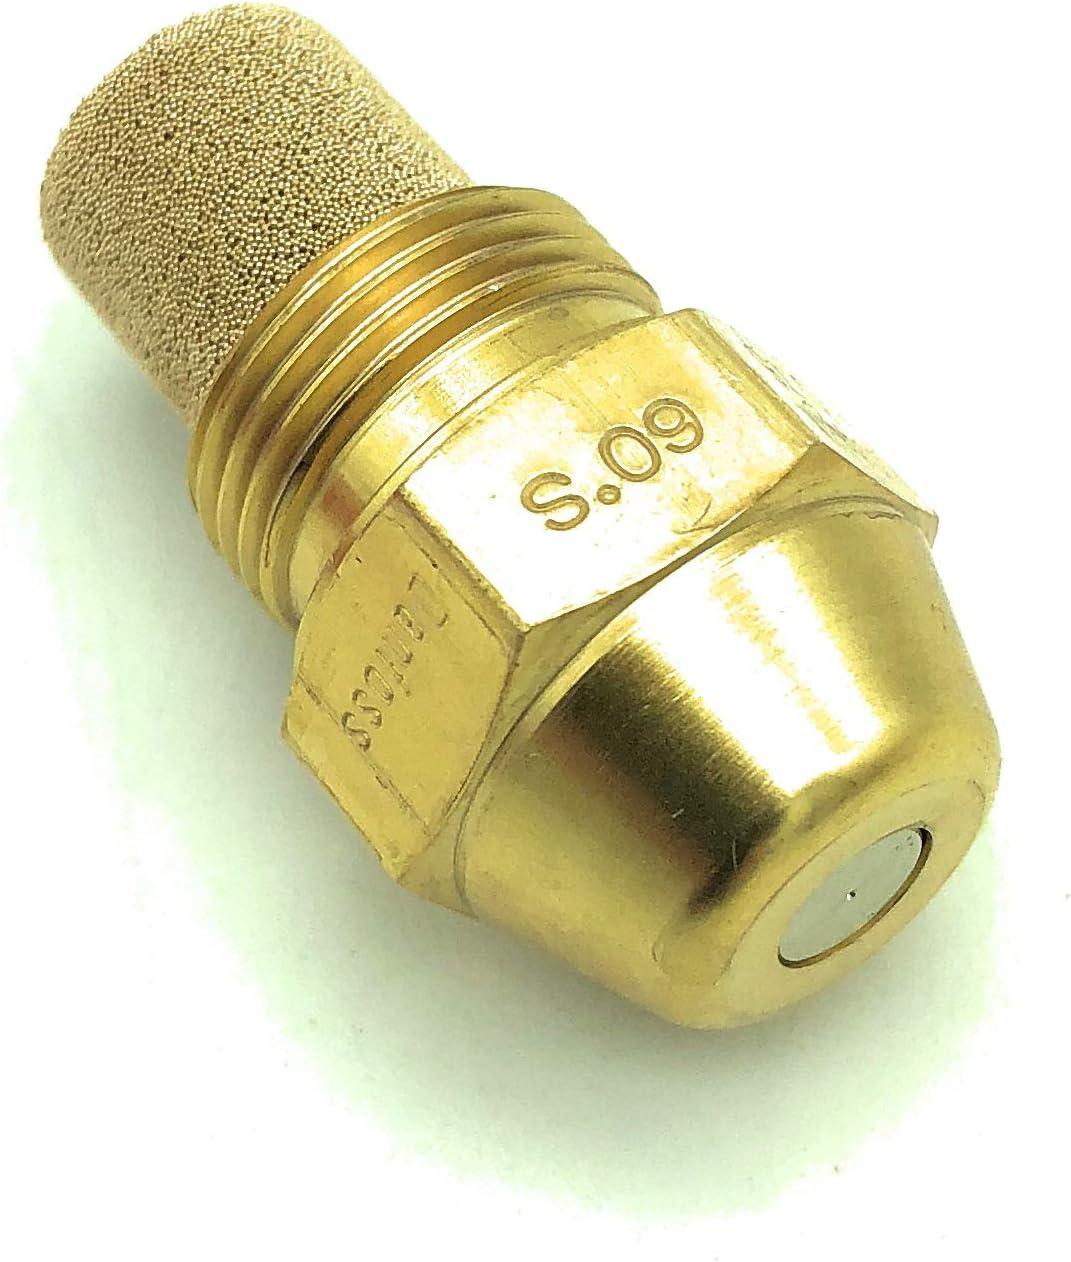 Danfoss s - Boquilla pulverizador s solido 60 2,94kg/h